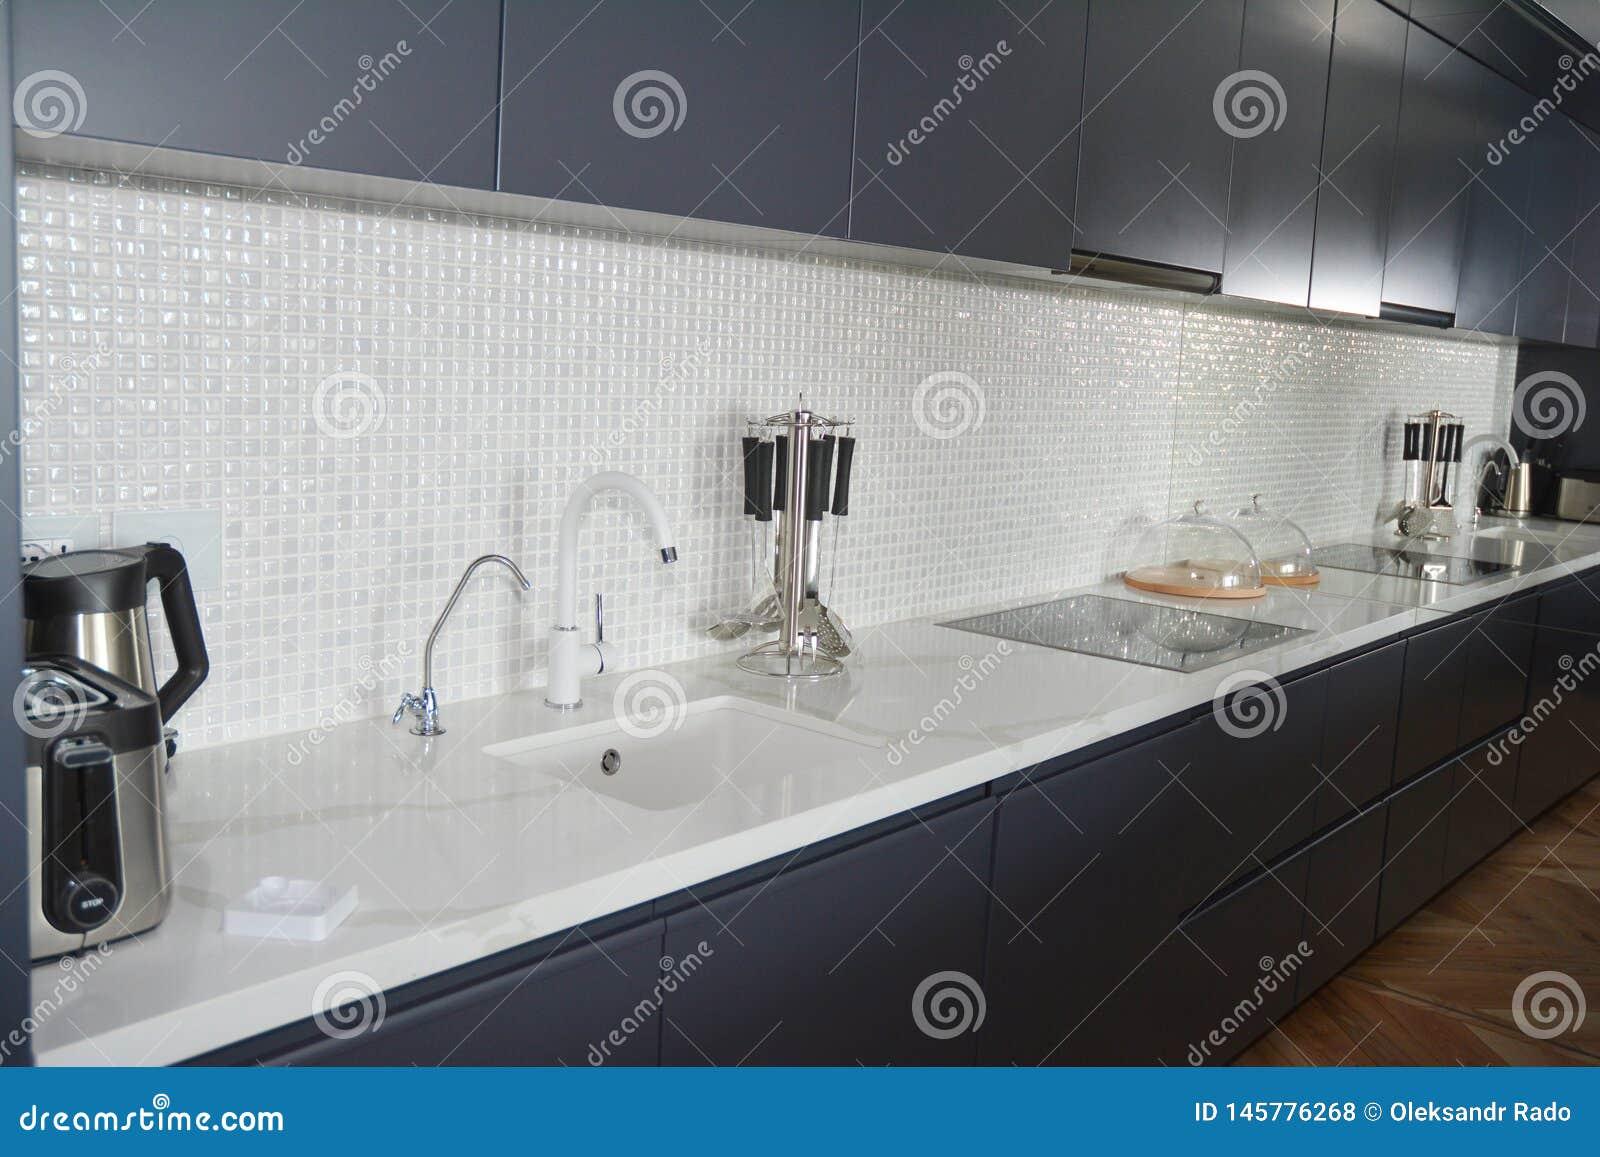 Modern Kitchen With Mosaic Tiles Faucet Kitchen Hood Mirror